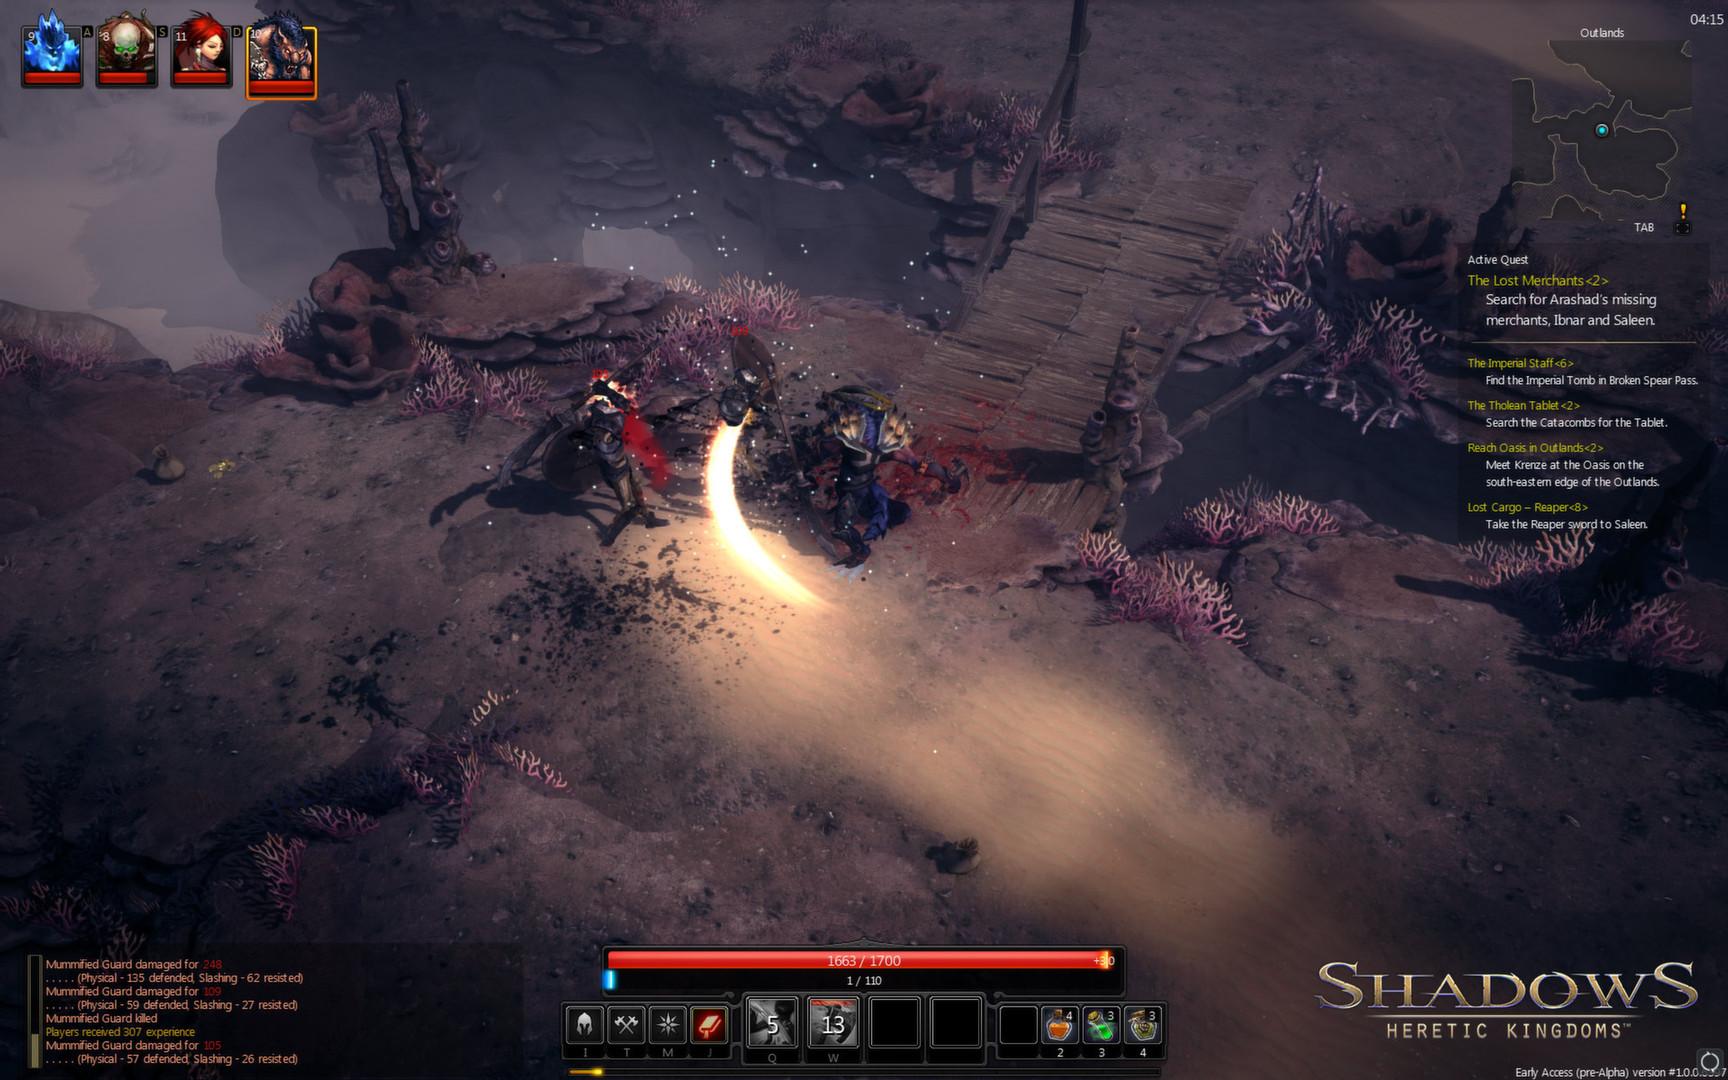 Shadows: Heretic Kingdoms screenshot 2